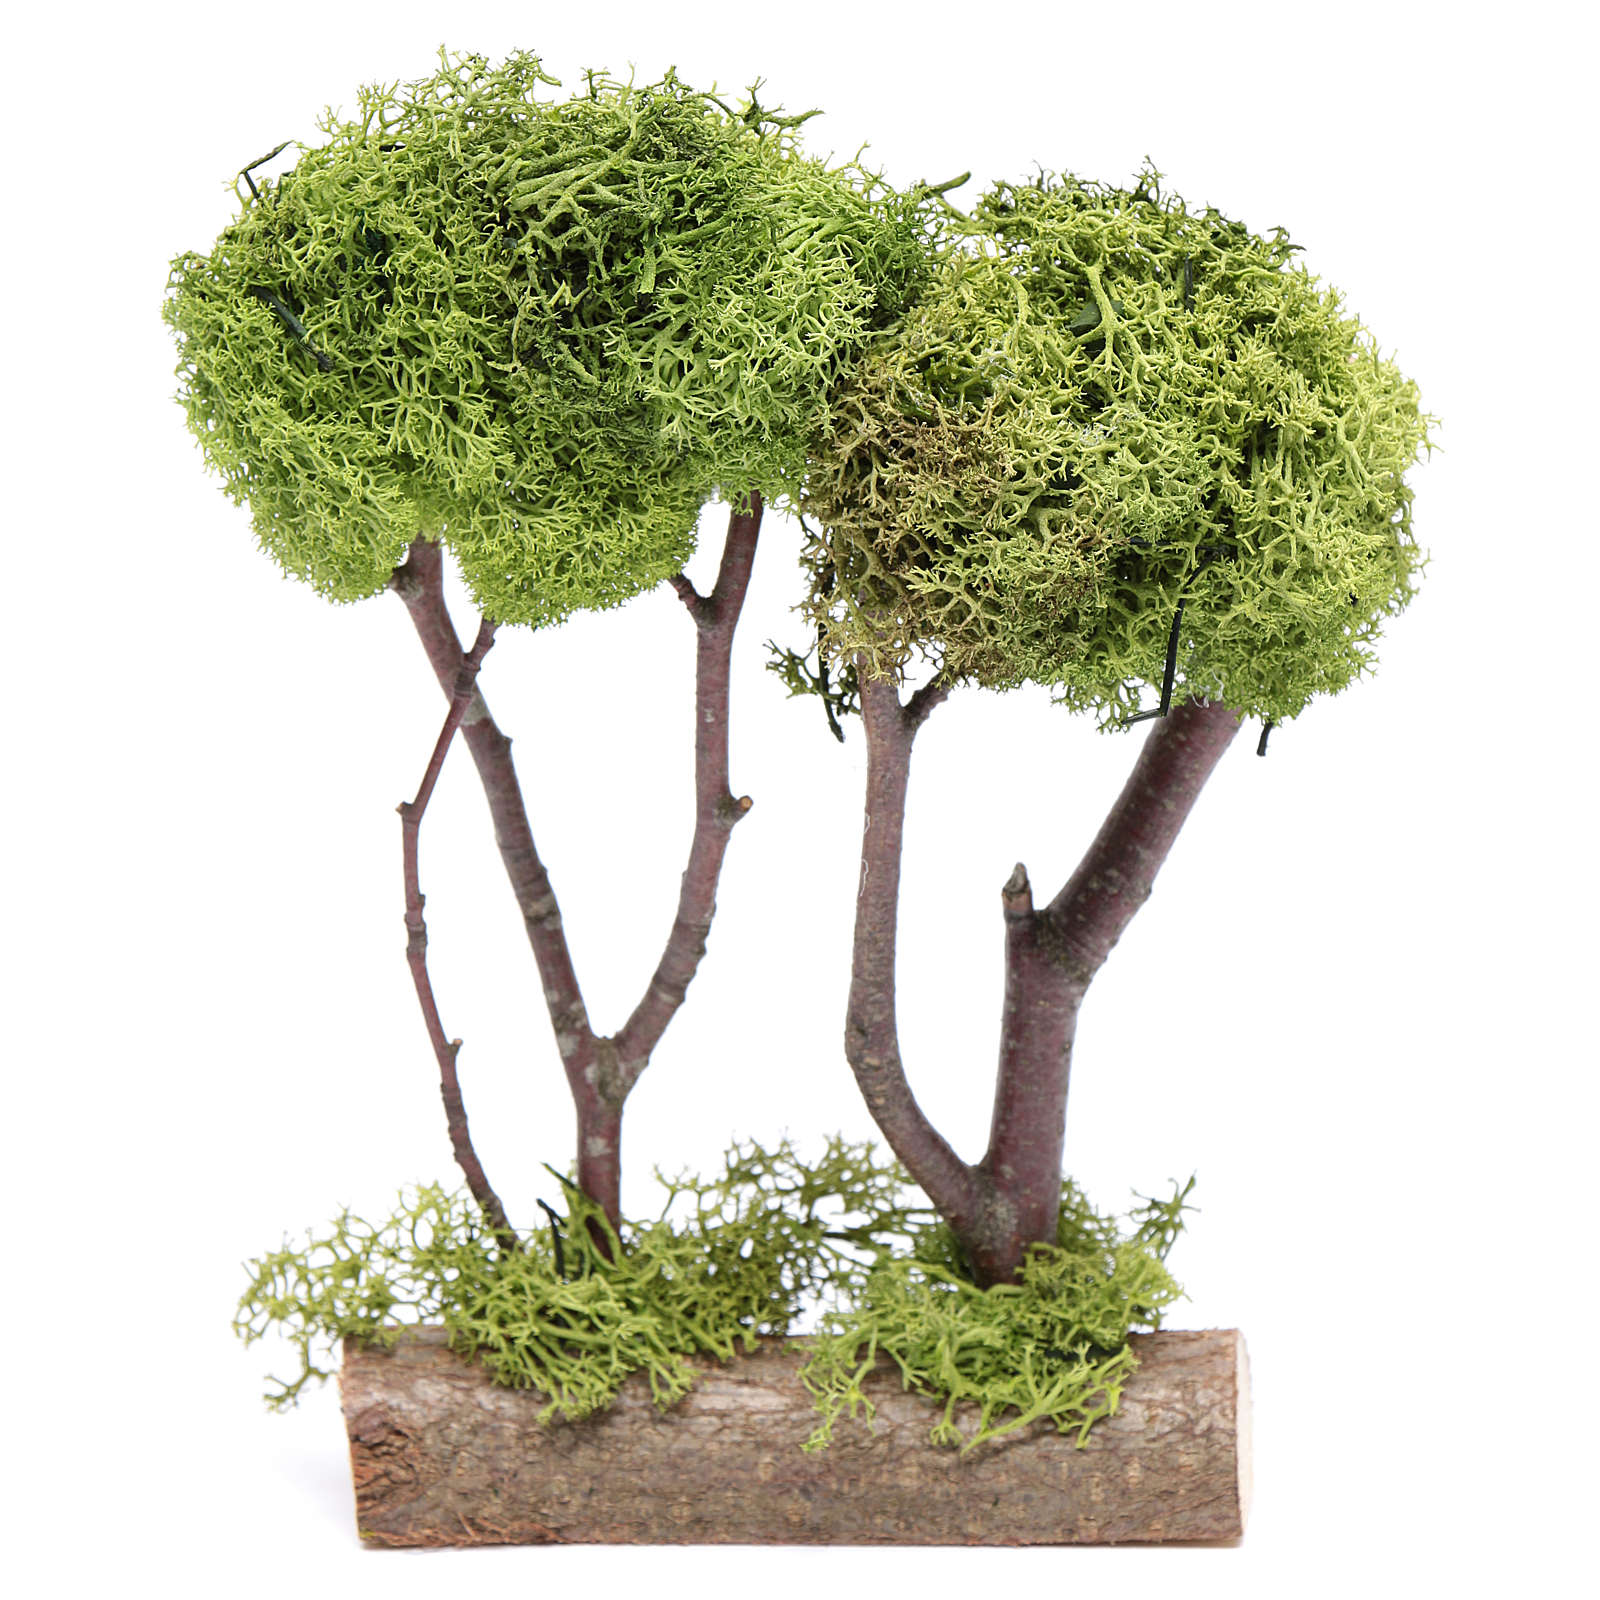 Árvore dupla líquen para presépio 20x15x5 cm 4